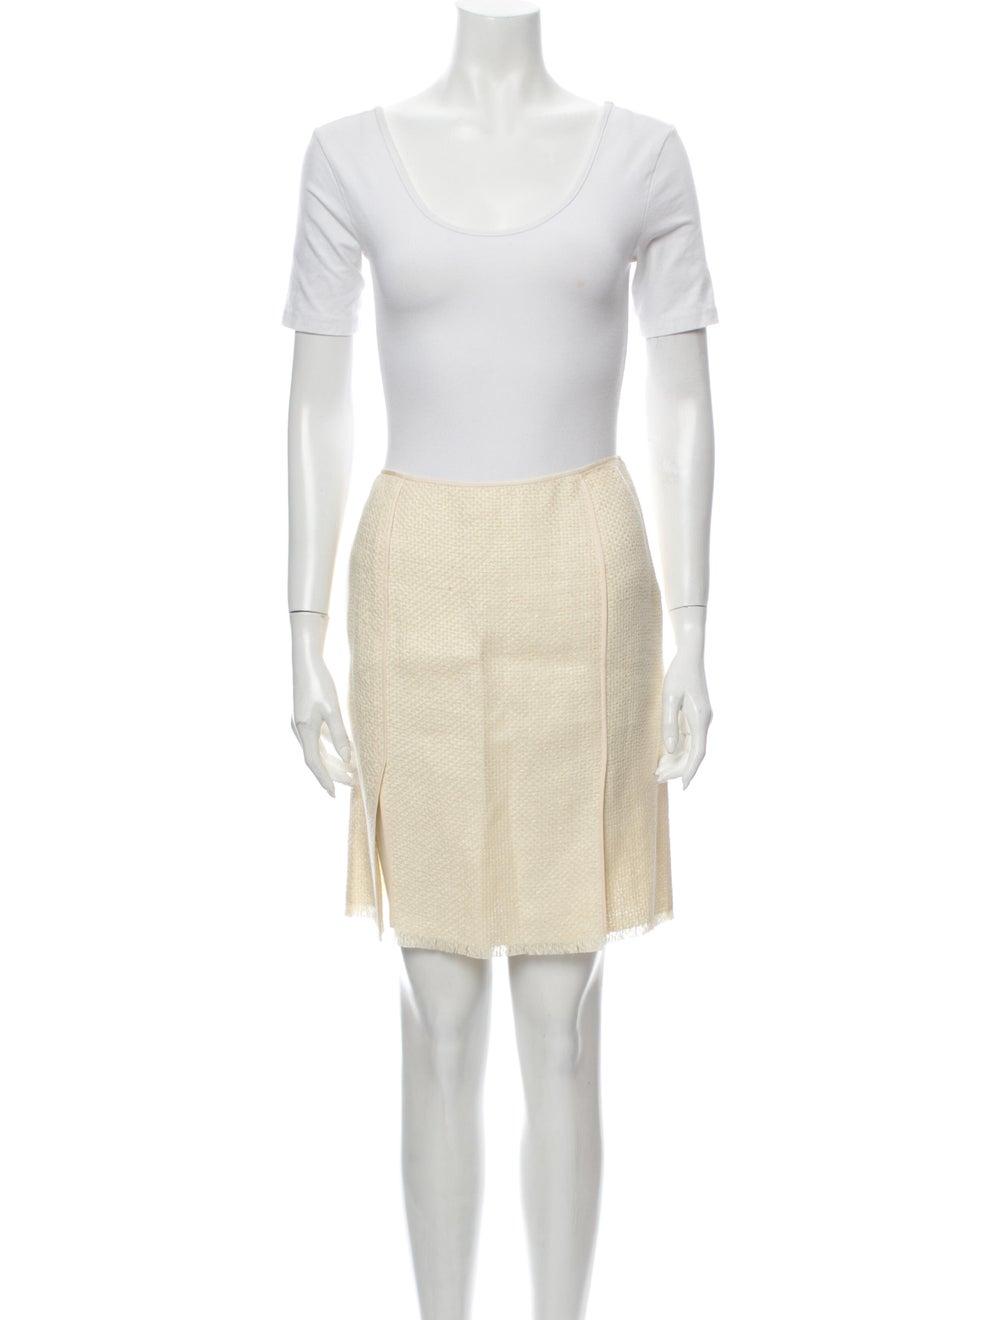 Donna Karan Linen Skirt Suit - image 4